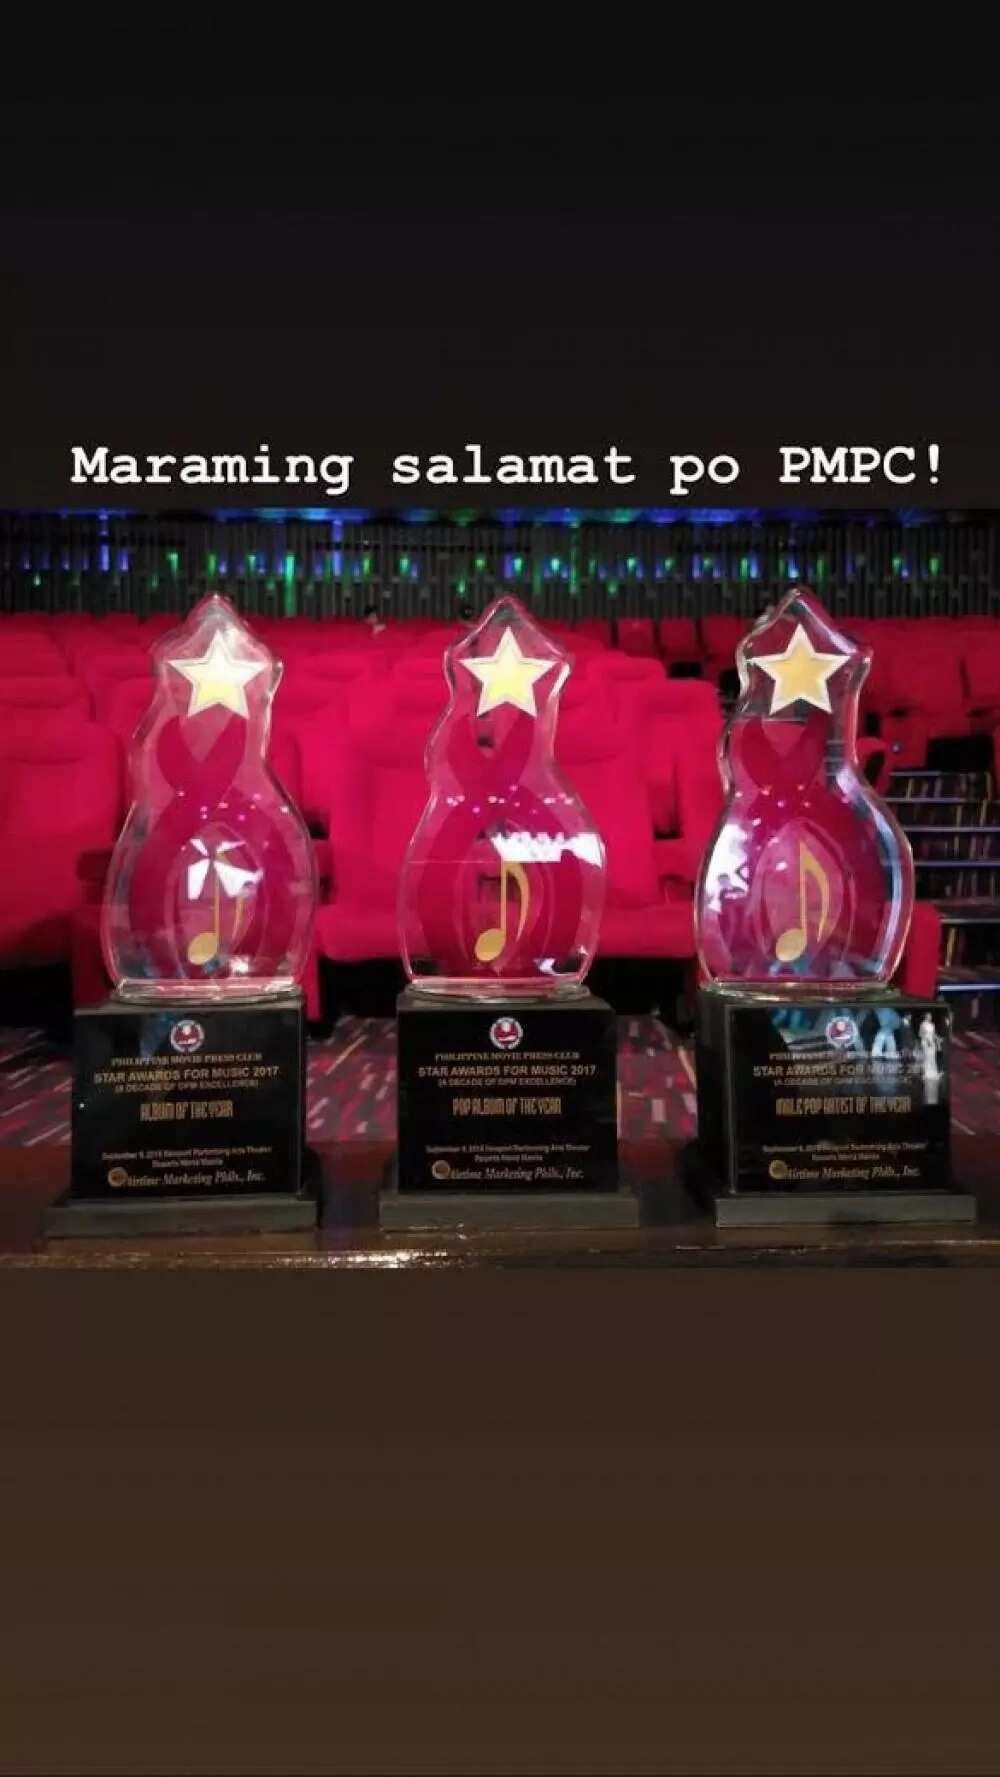 Super galing! Alden Richards, humakot ng parangal sa PMPC Star Awards for Music